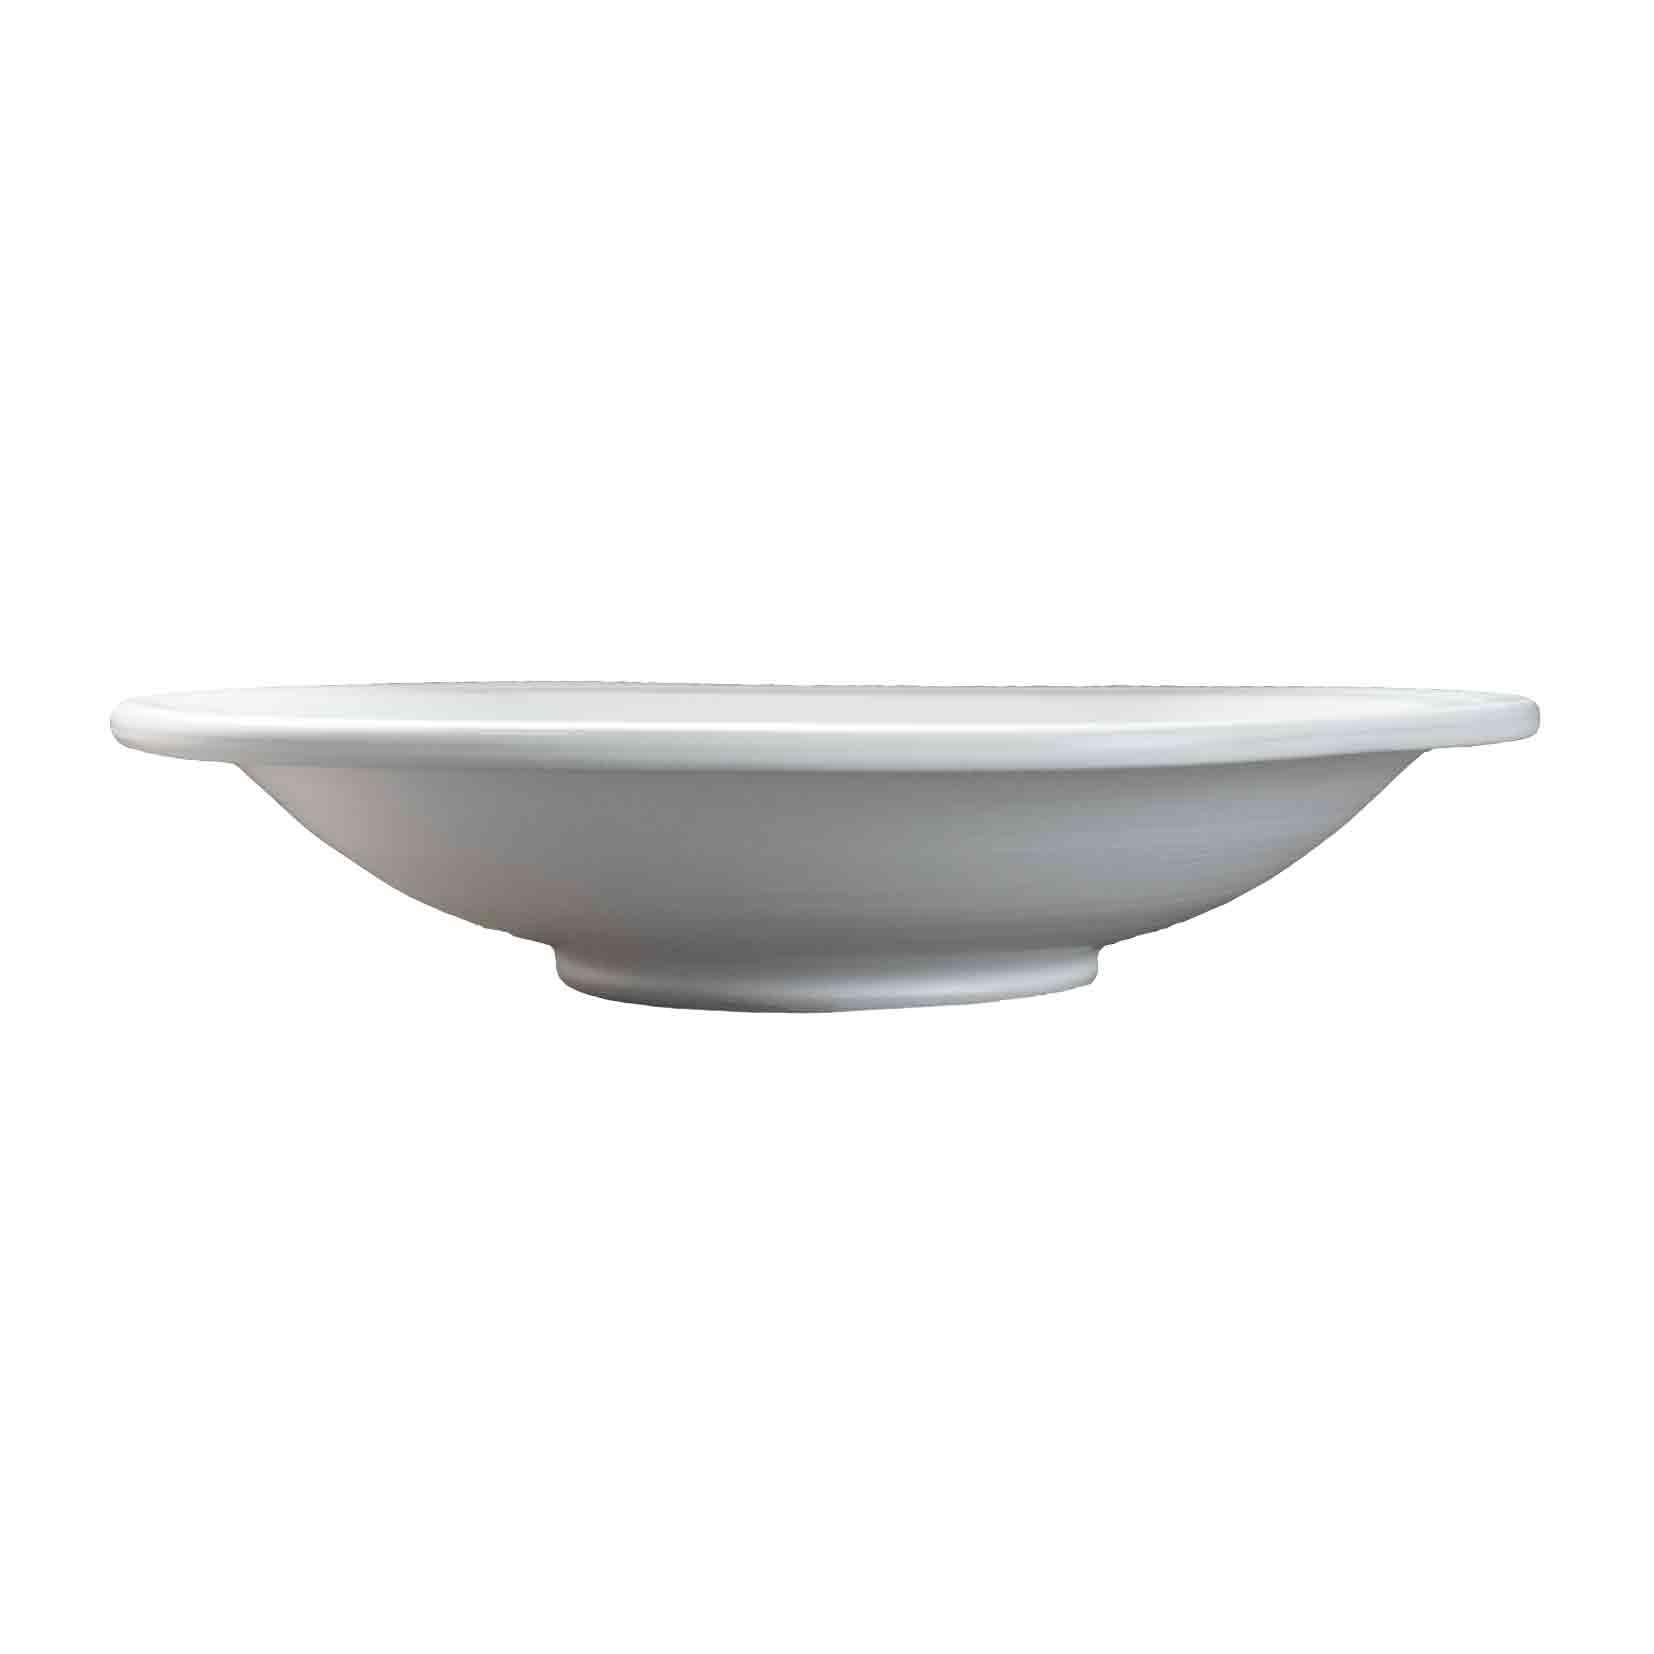 DBKD Plain Dish White, M